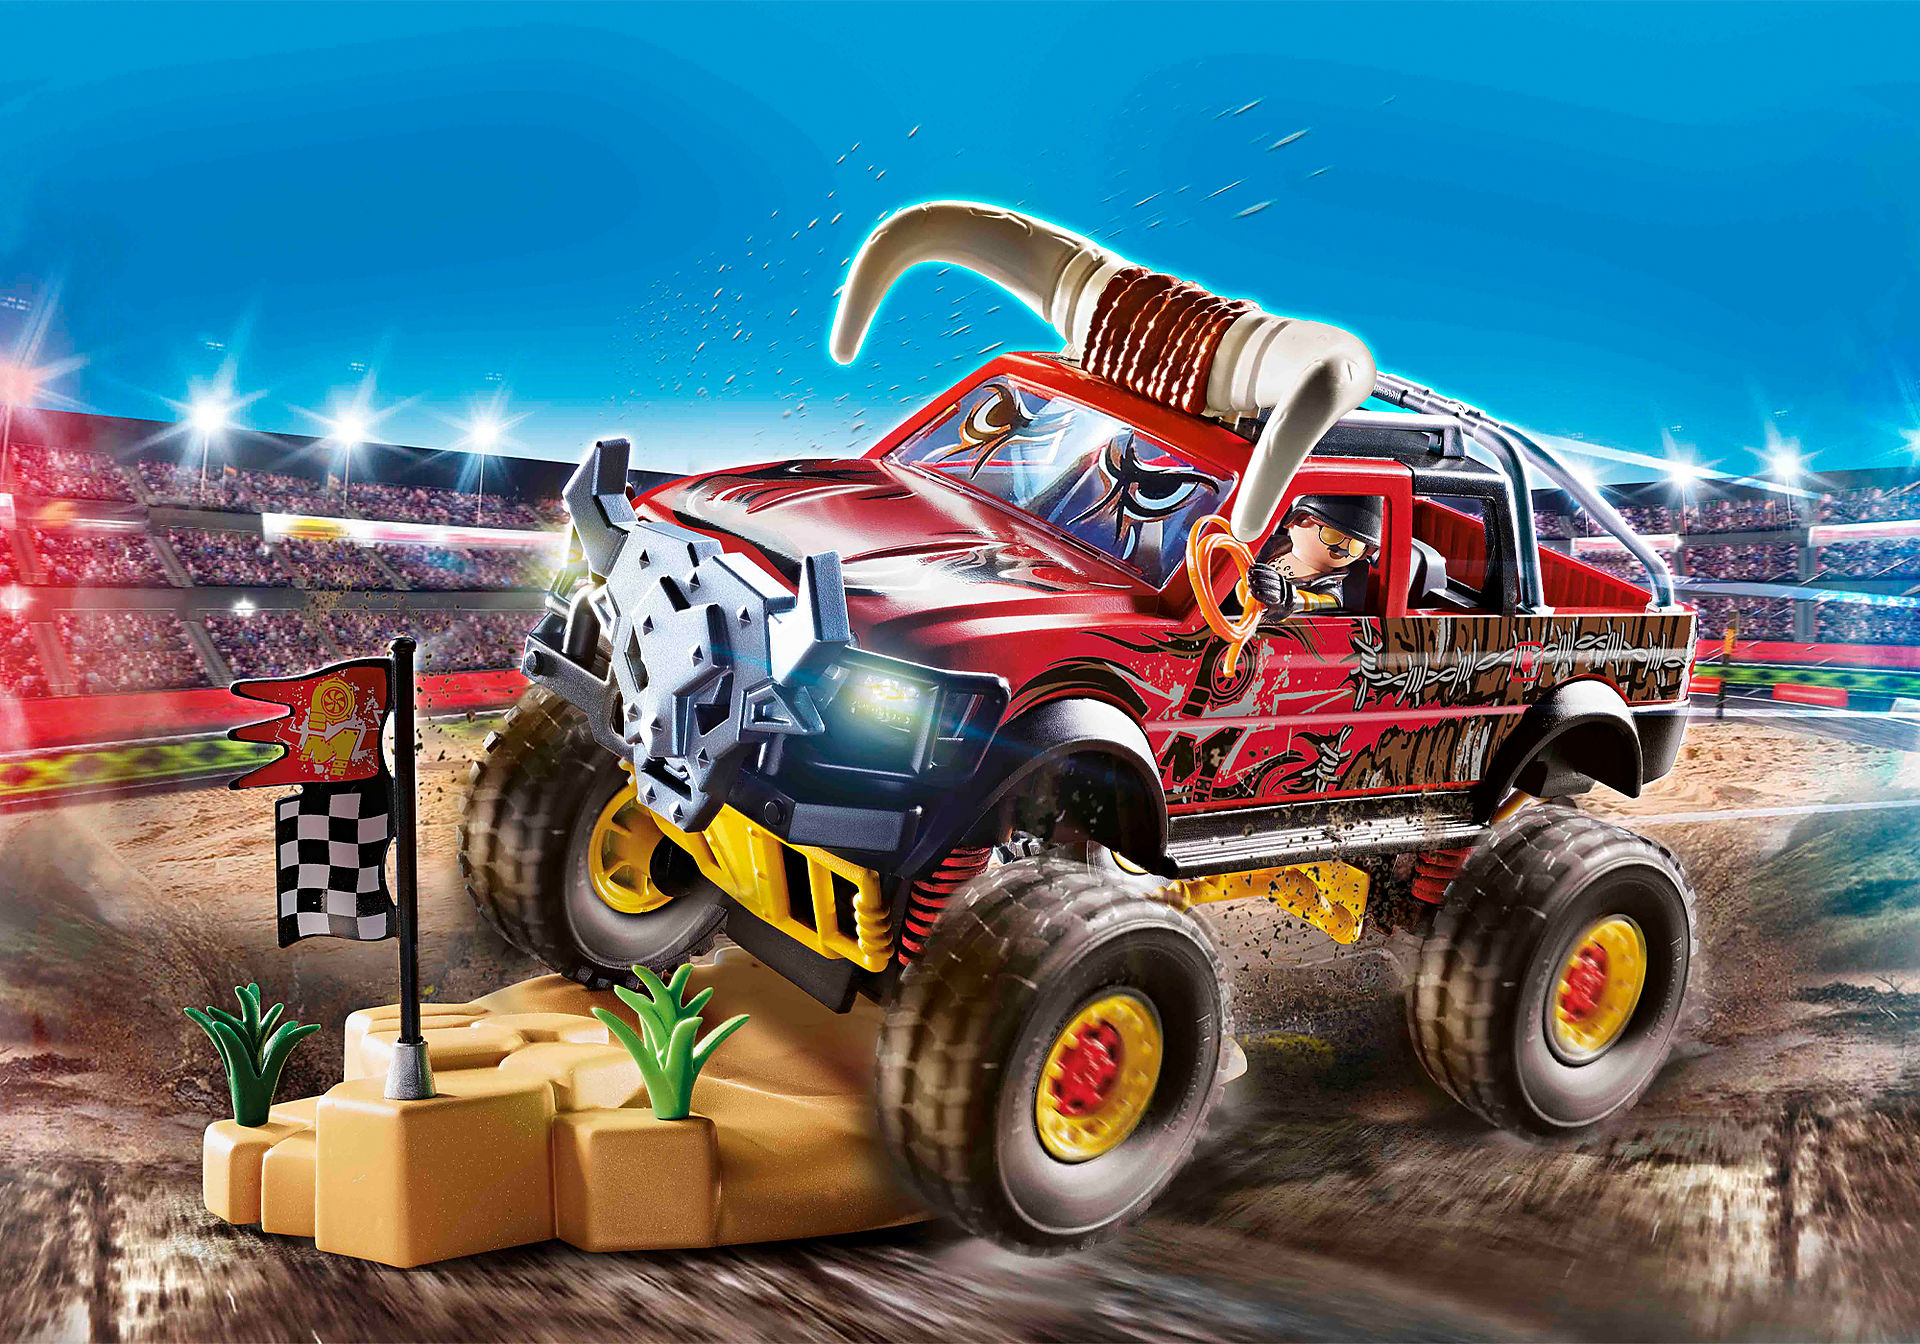 70549 Pokaz kaskaderski: Monster Truck Rogacz zoom image1